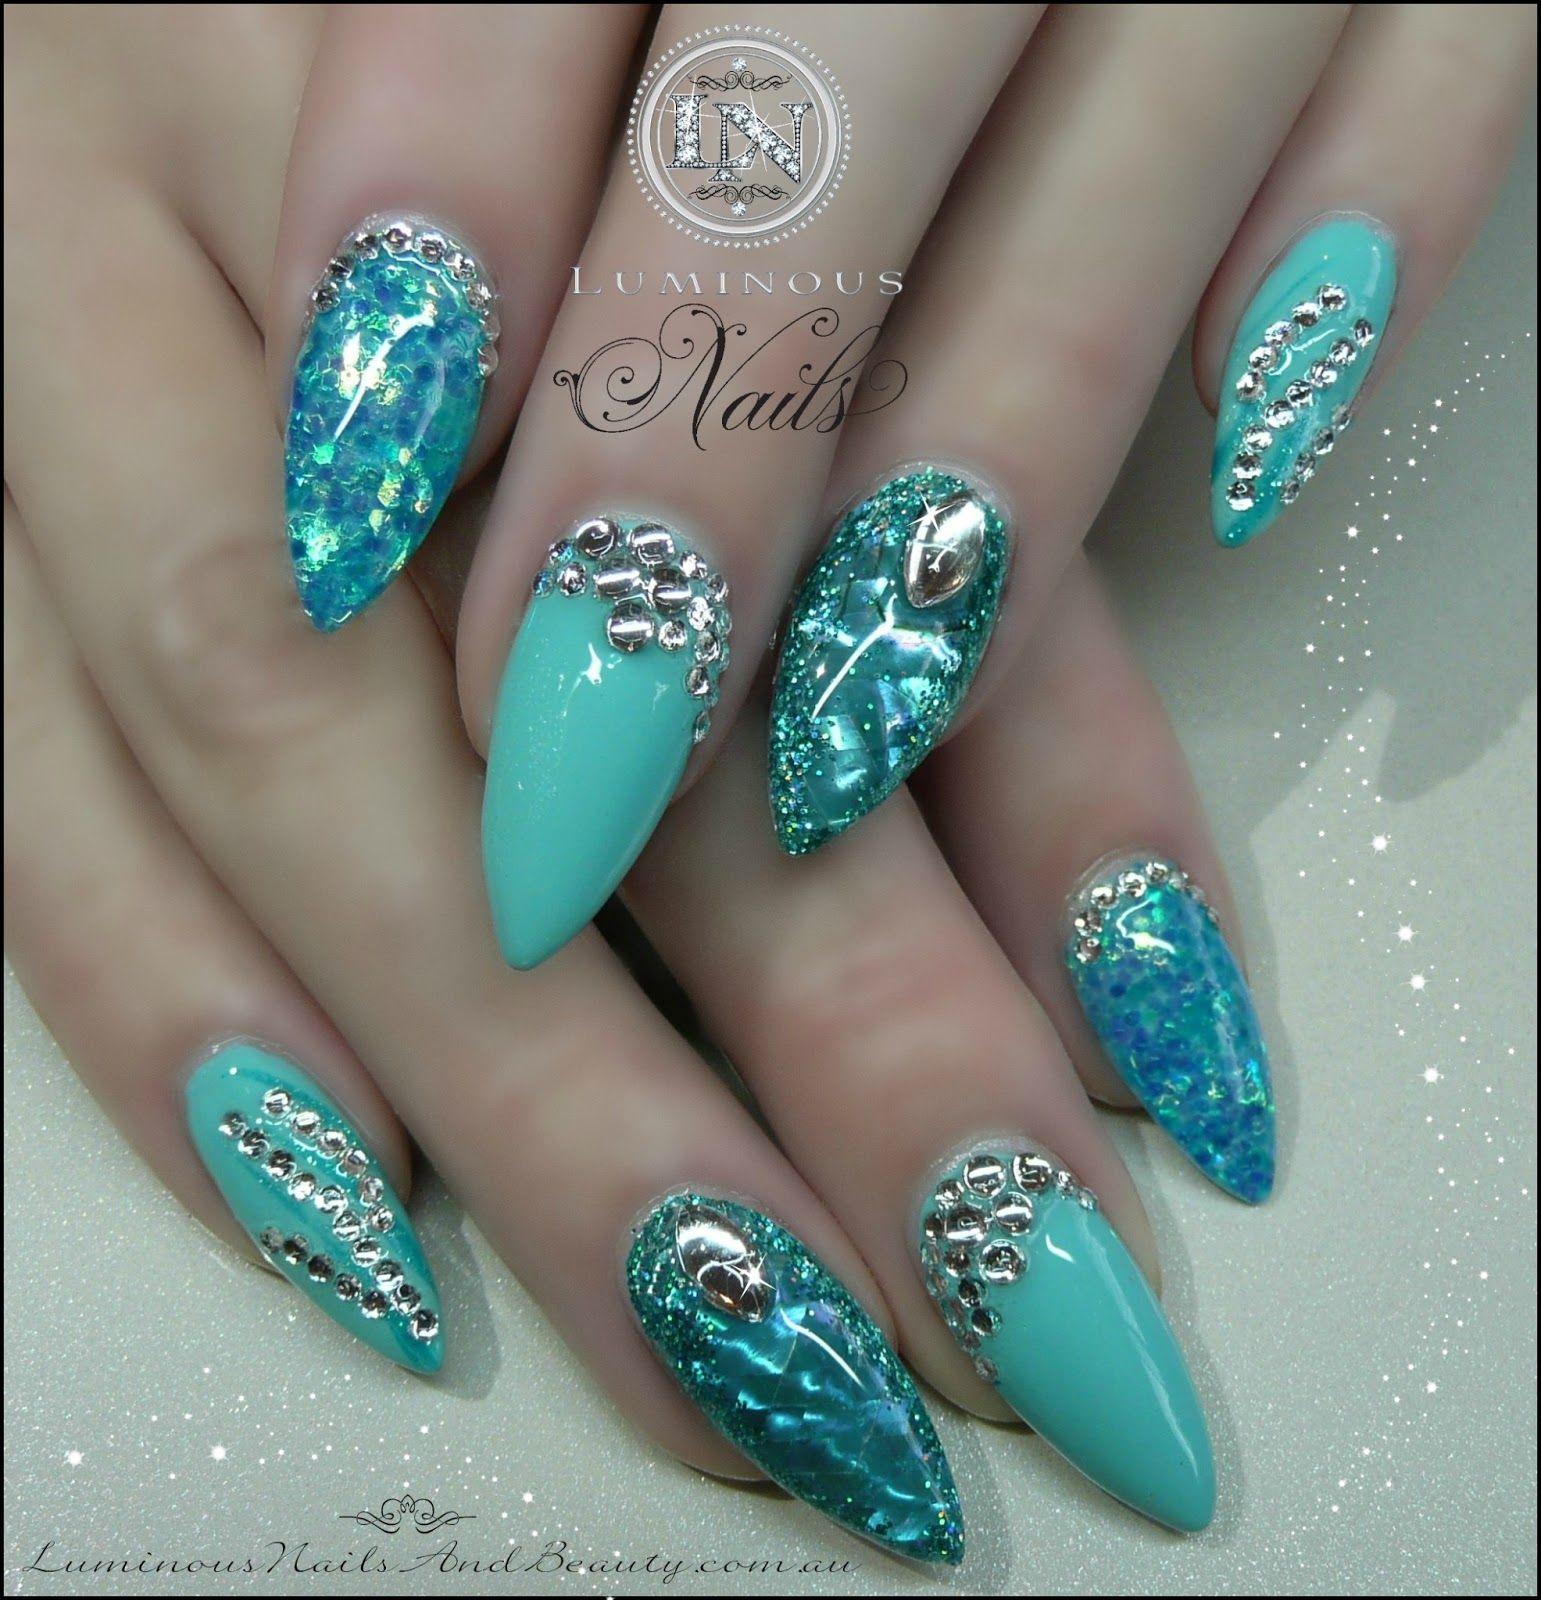 Luminous Nails   Arte   Pinterest   Best Luminous nails and White ...